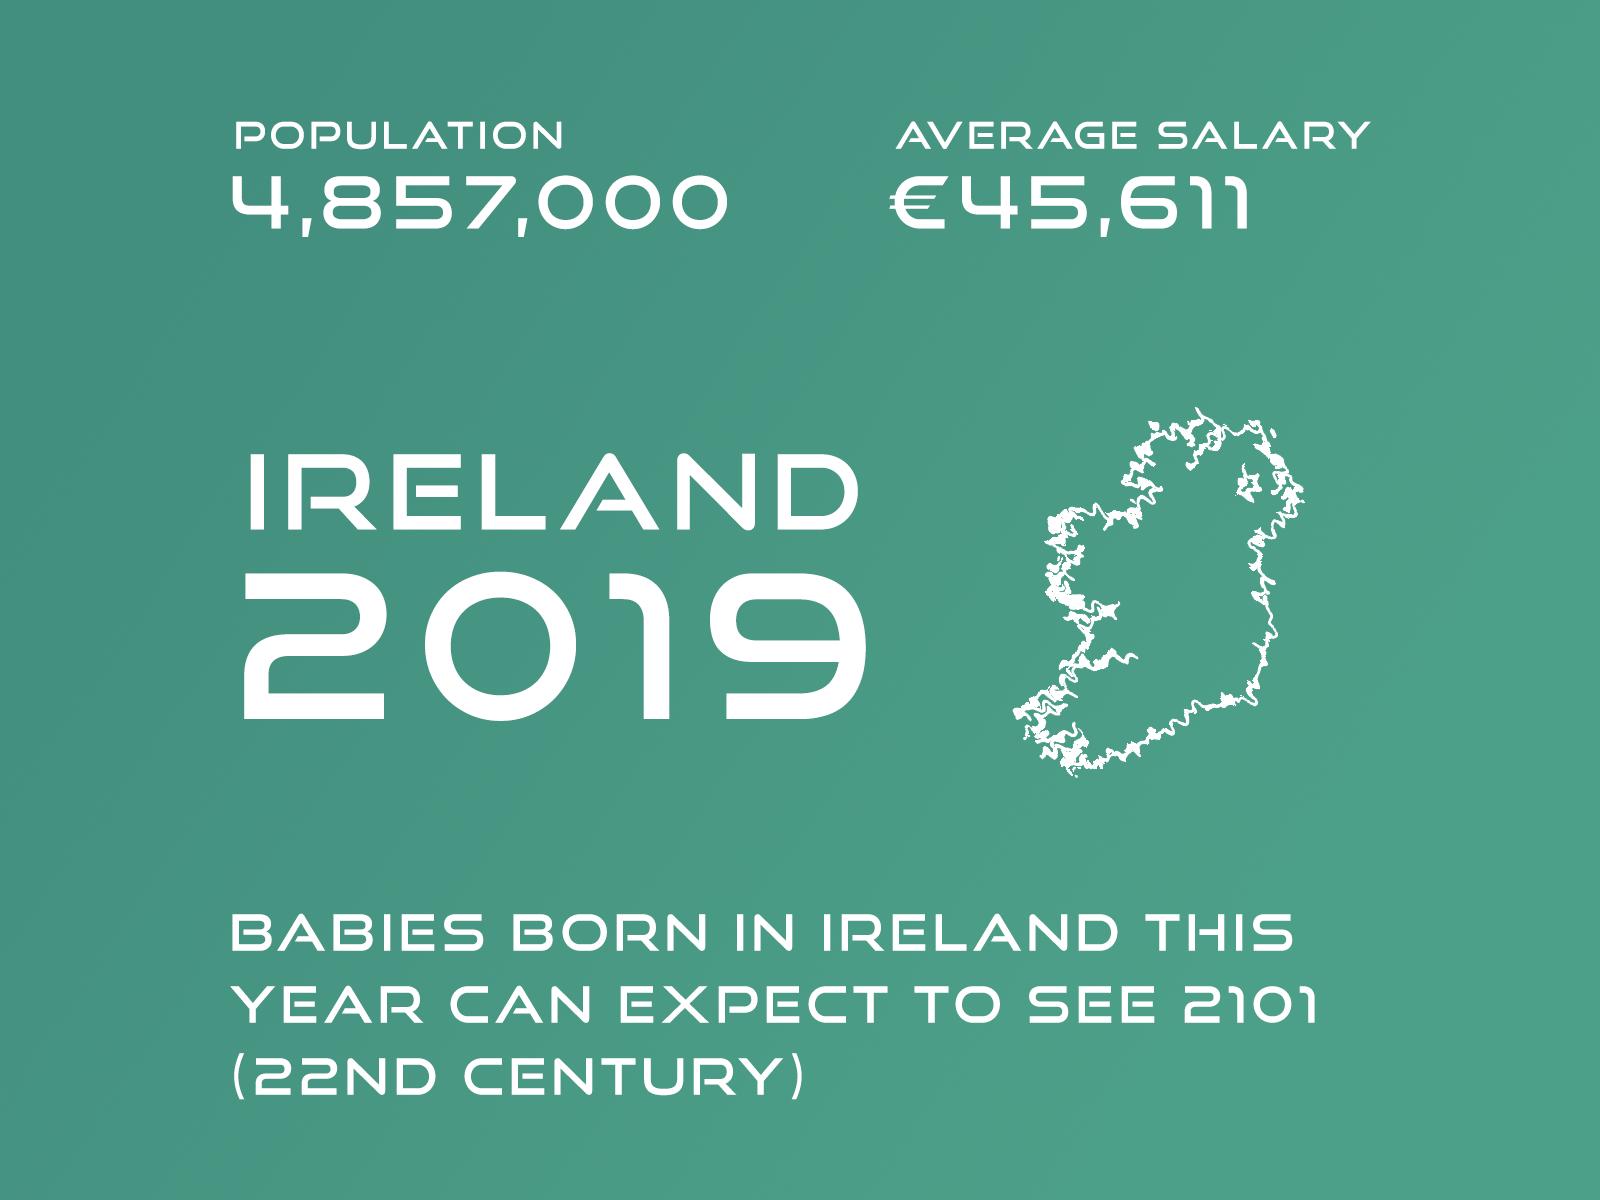 Ireland 2019 by Dermot McDonagh on Dribbble